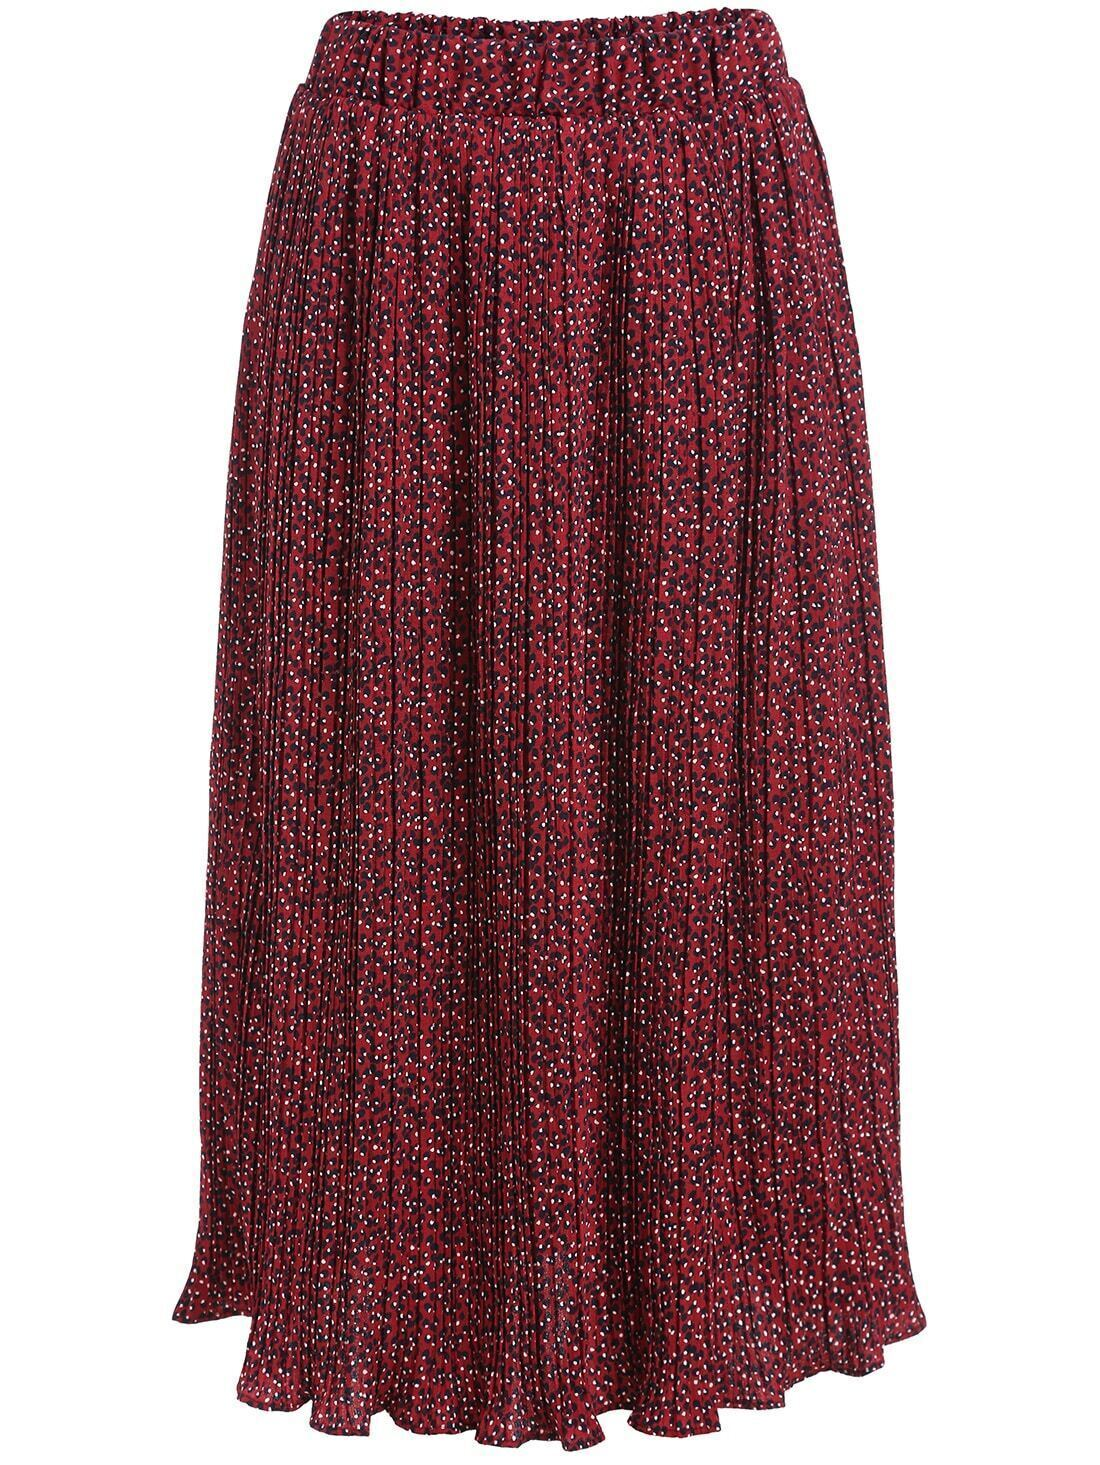 elastic waist polka dot pleated skirt